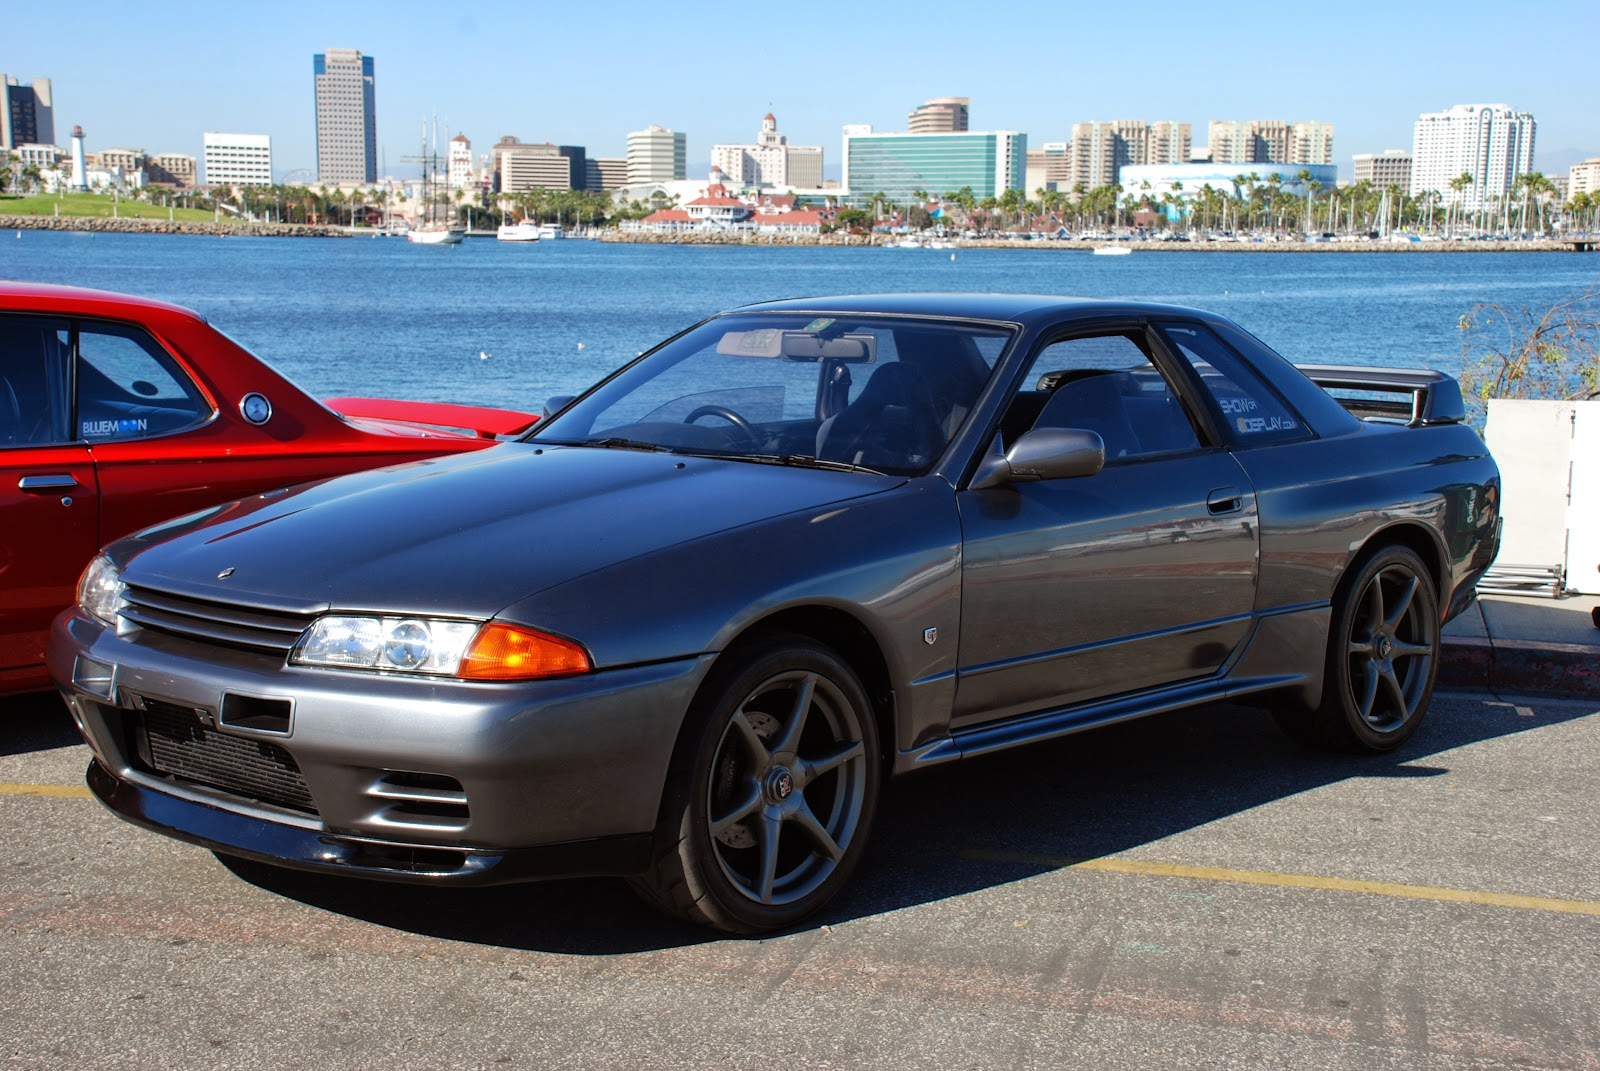 Nissan Skyline GT-R s in the USA Blog: January 2014